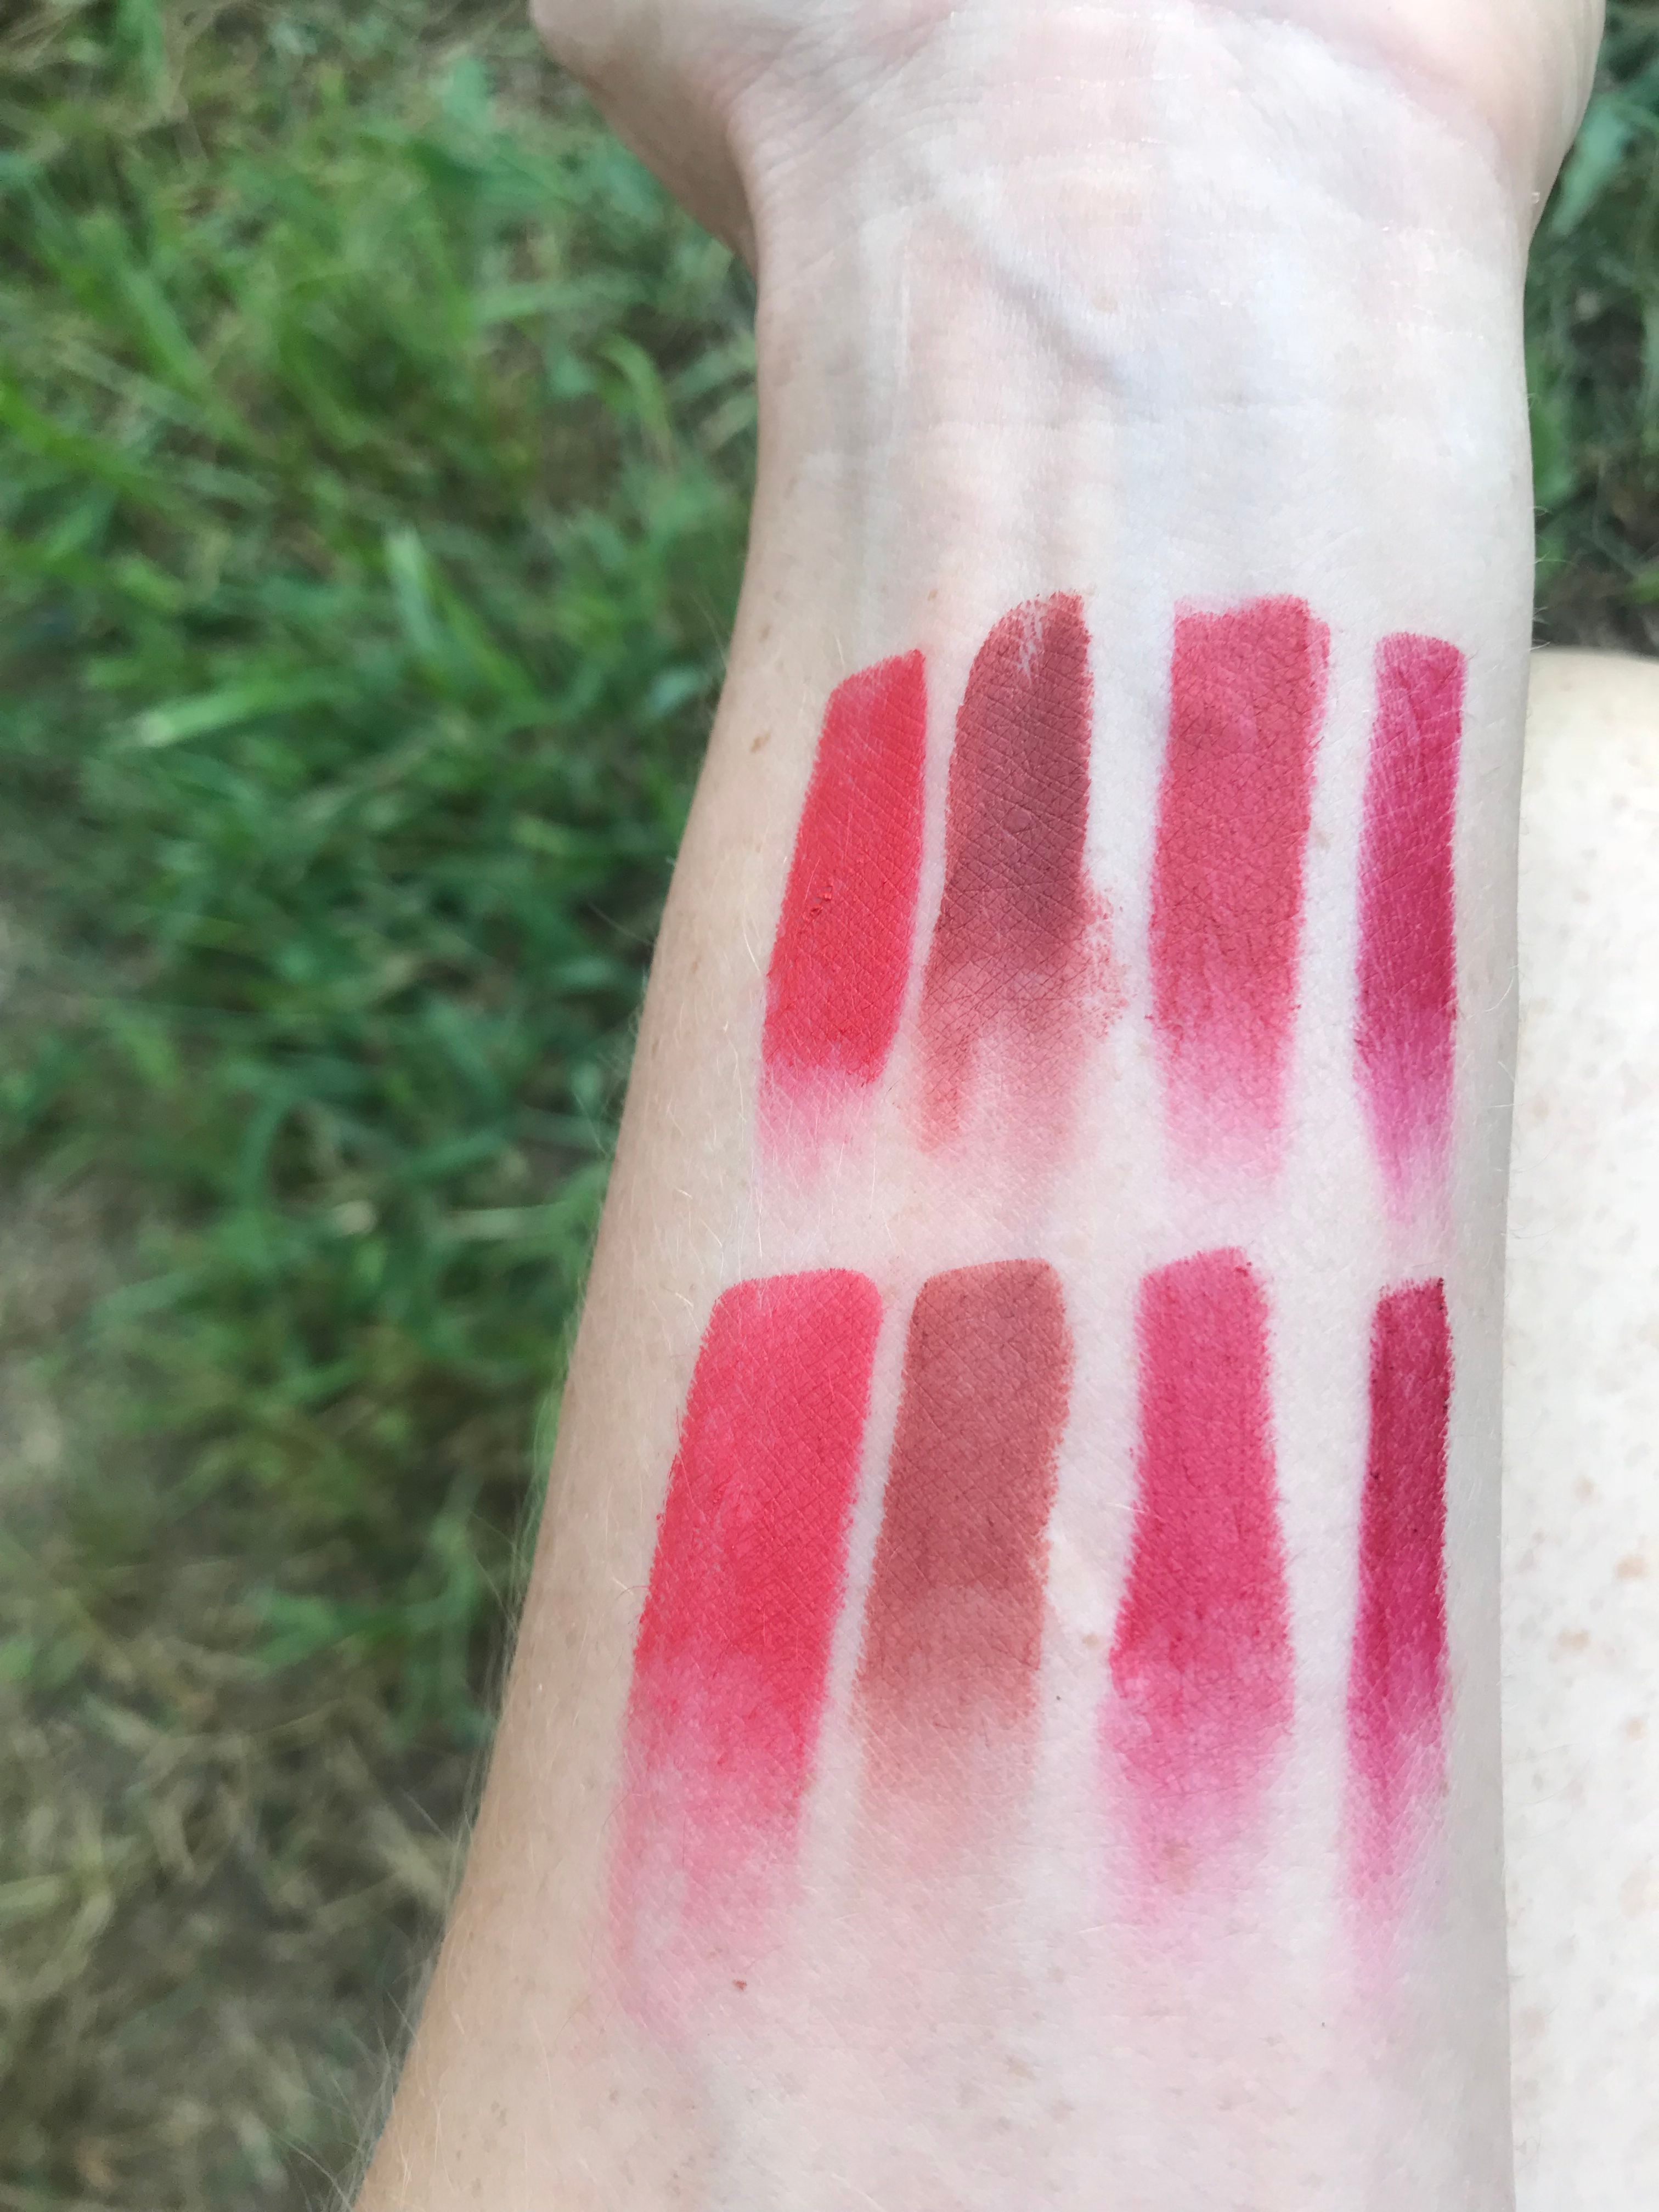 Modern Matte Powder Lipstick by Shiseido #11